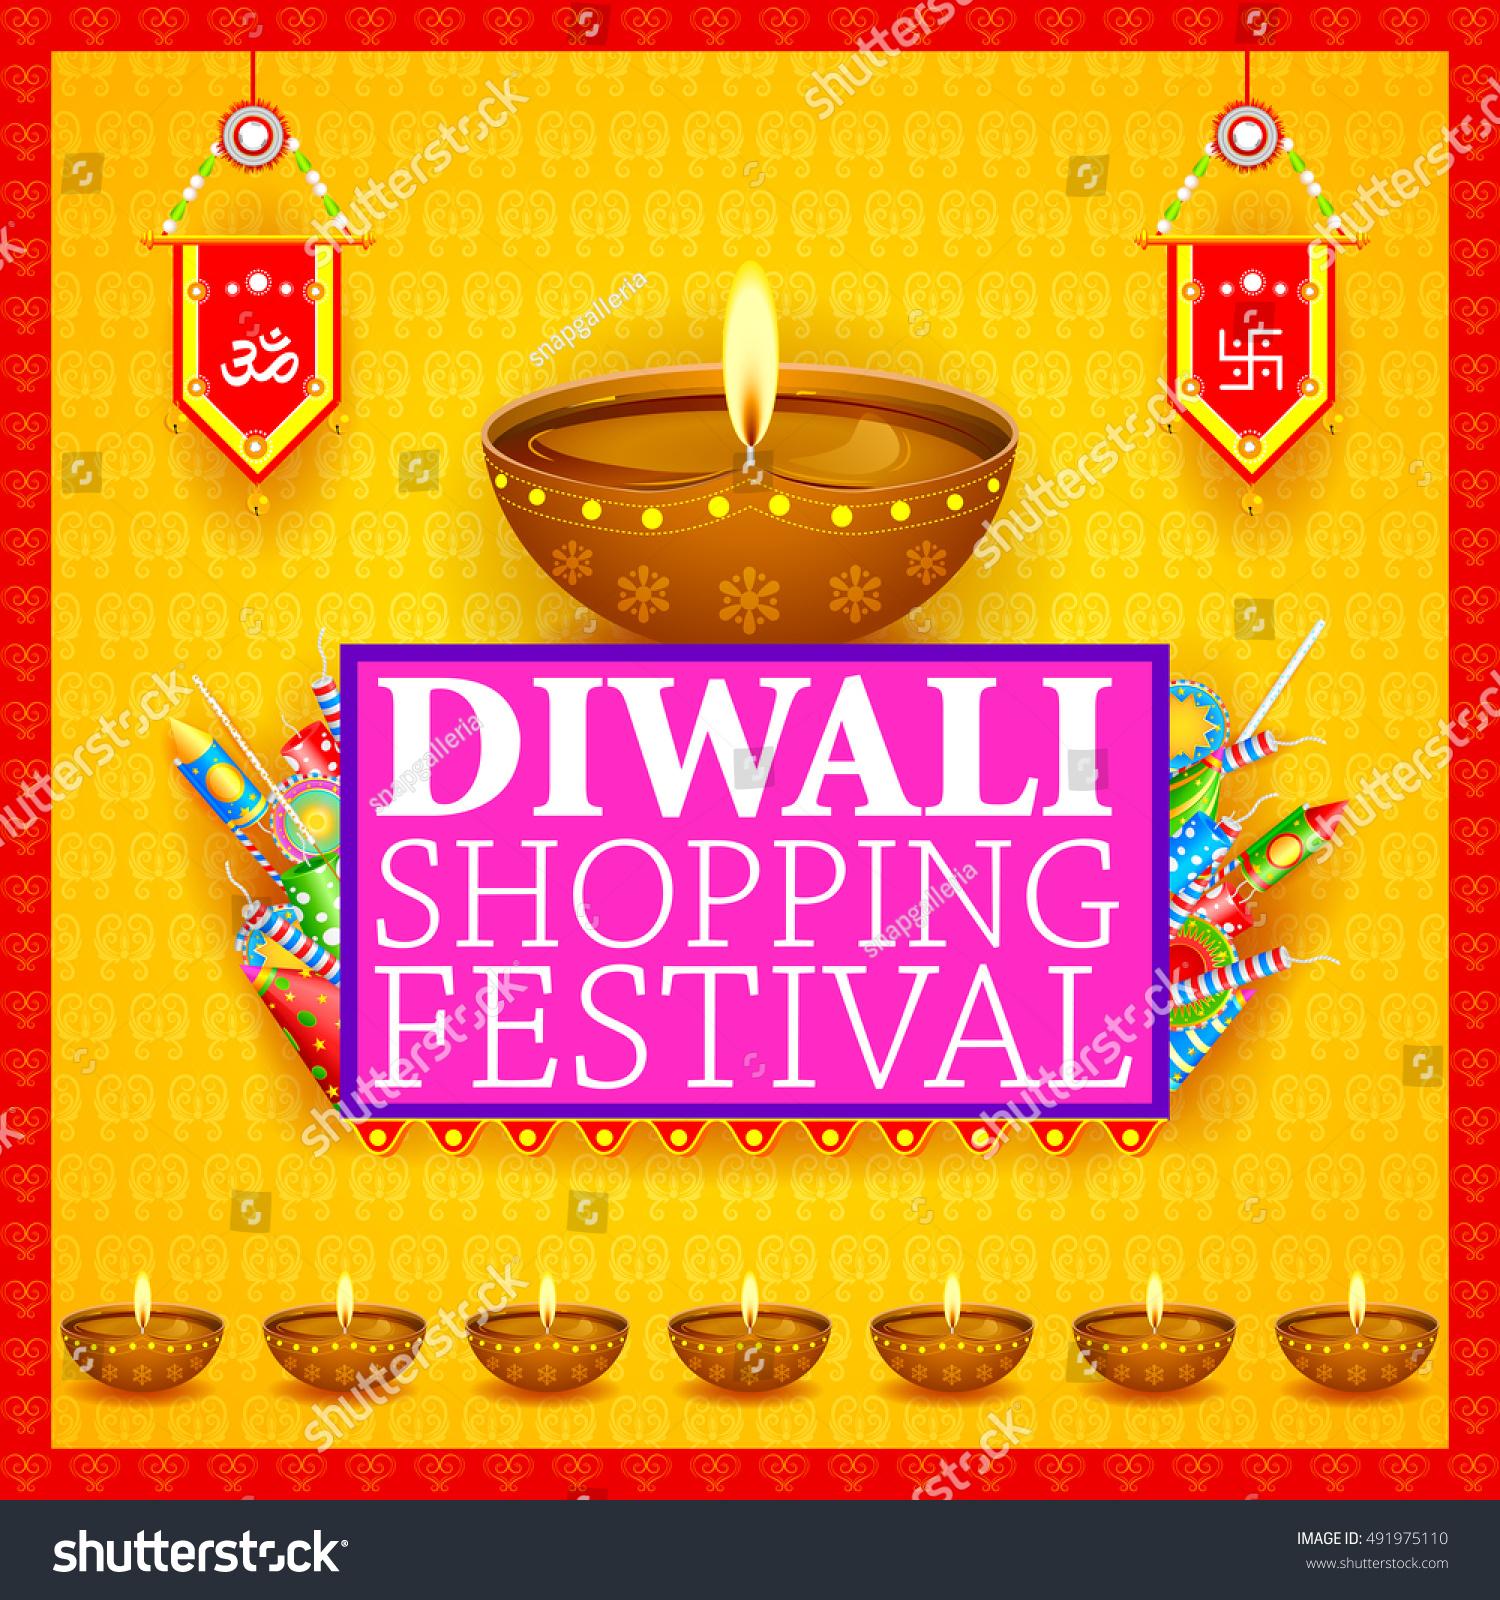 Diwali Lights Online Shop: Easy Edit Vector Illustration Happy Diwali Stock Vector